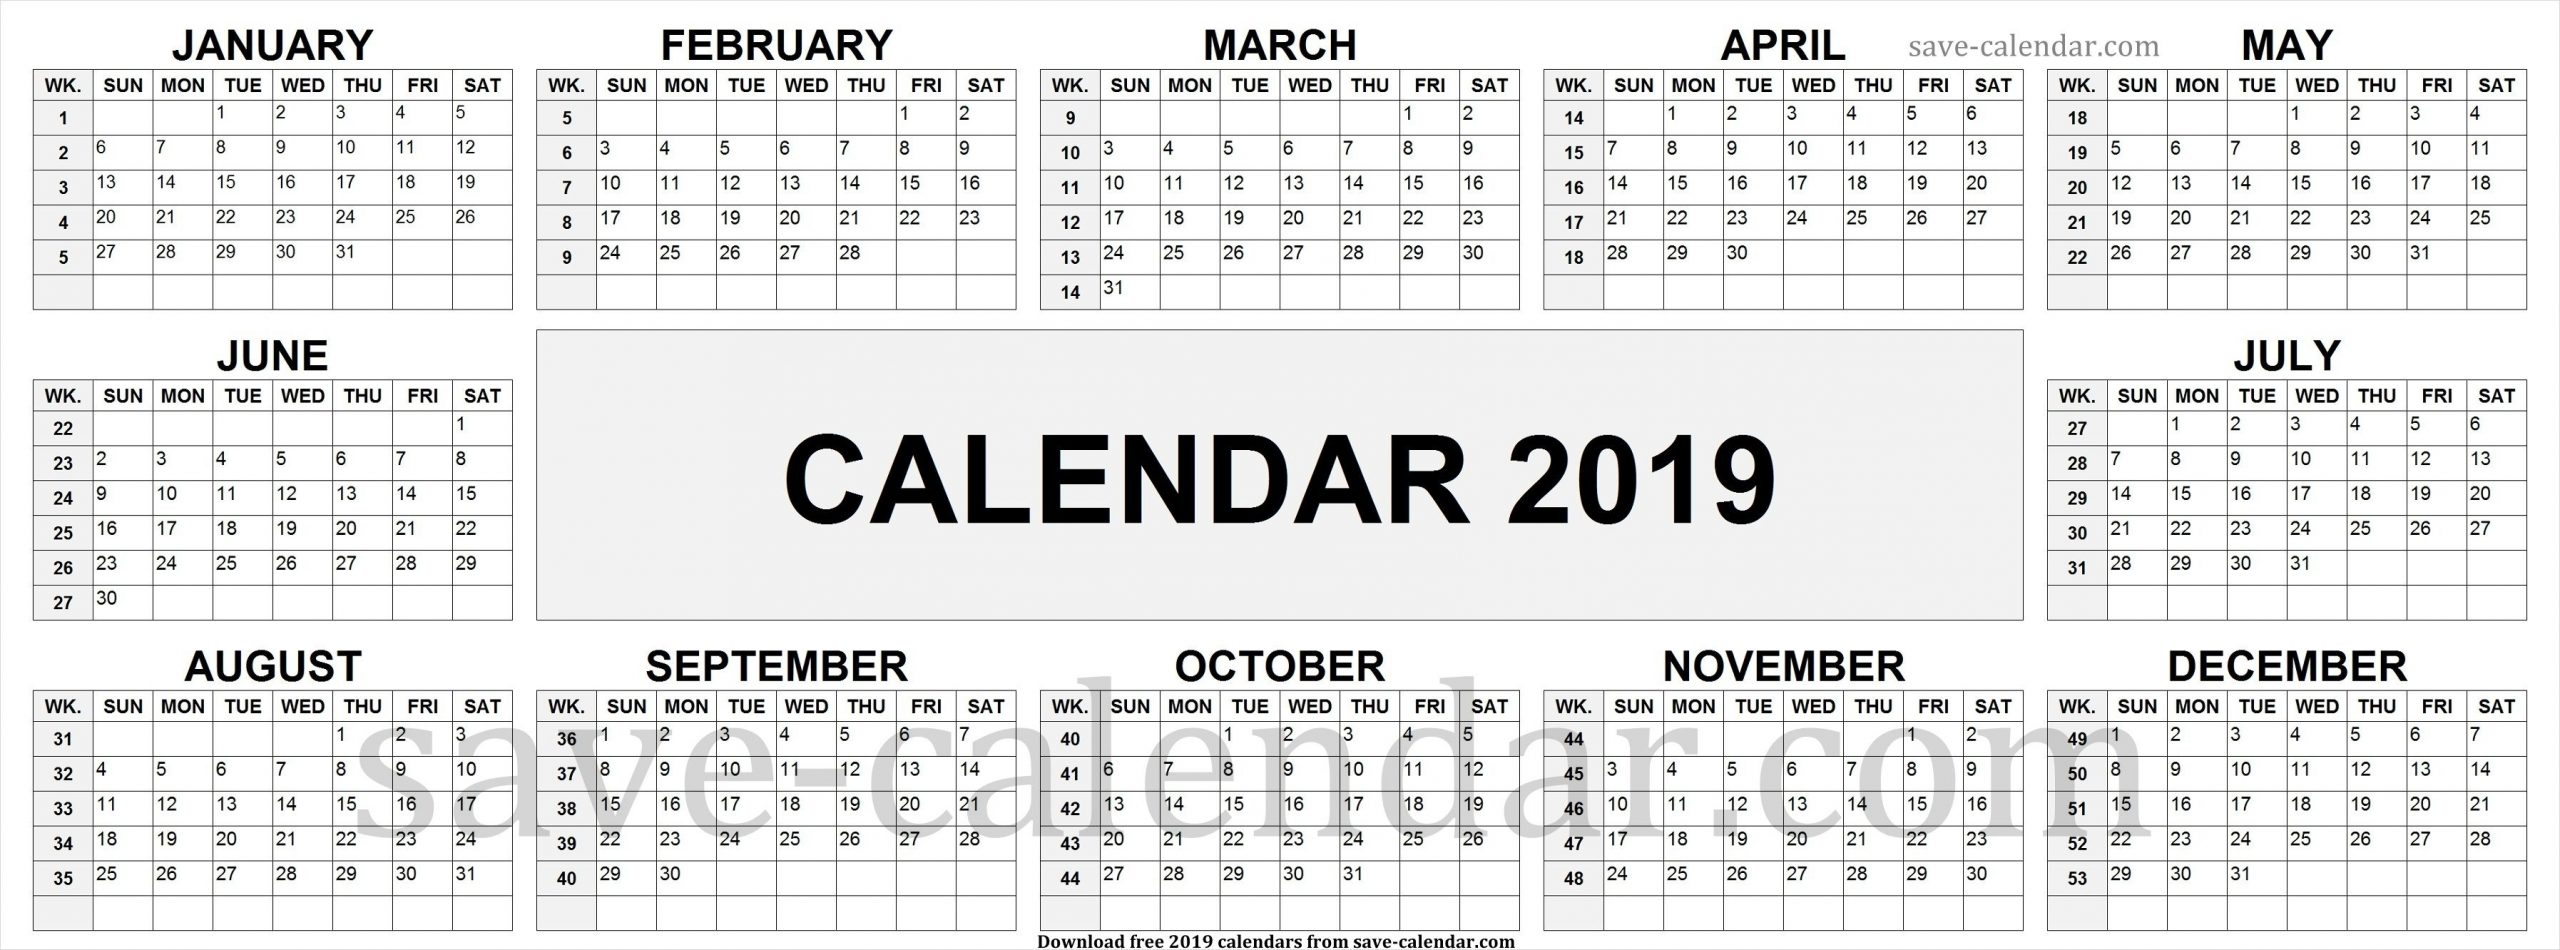 Take Depo Provera Perpetual Calendar 2020 | Calendar inside Depo Provera Injection Calendar 2021